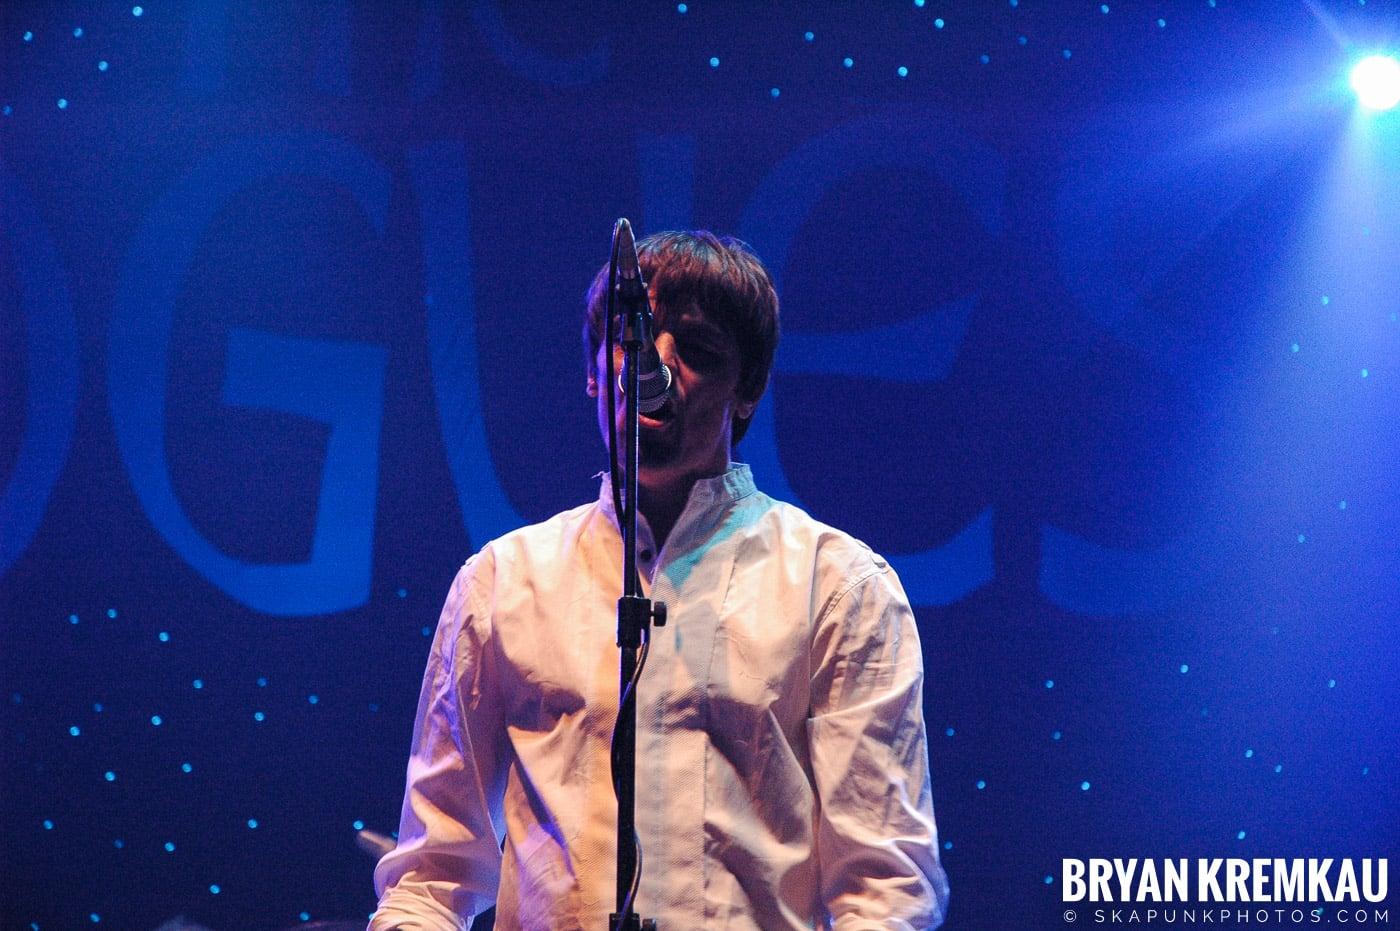 The Pogues @ Brixton Academy, London UK - 12.19.05 (26)